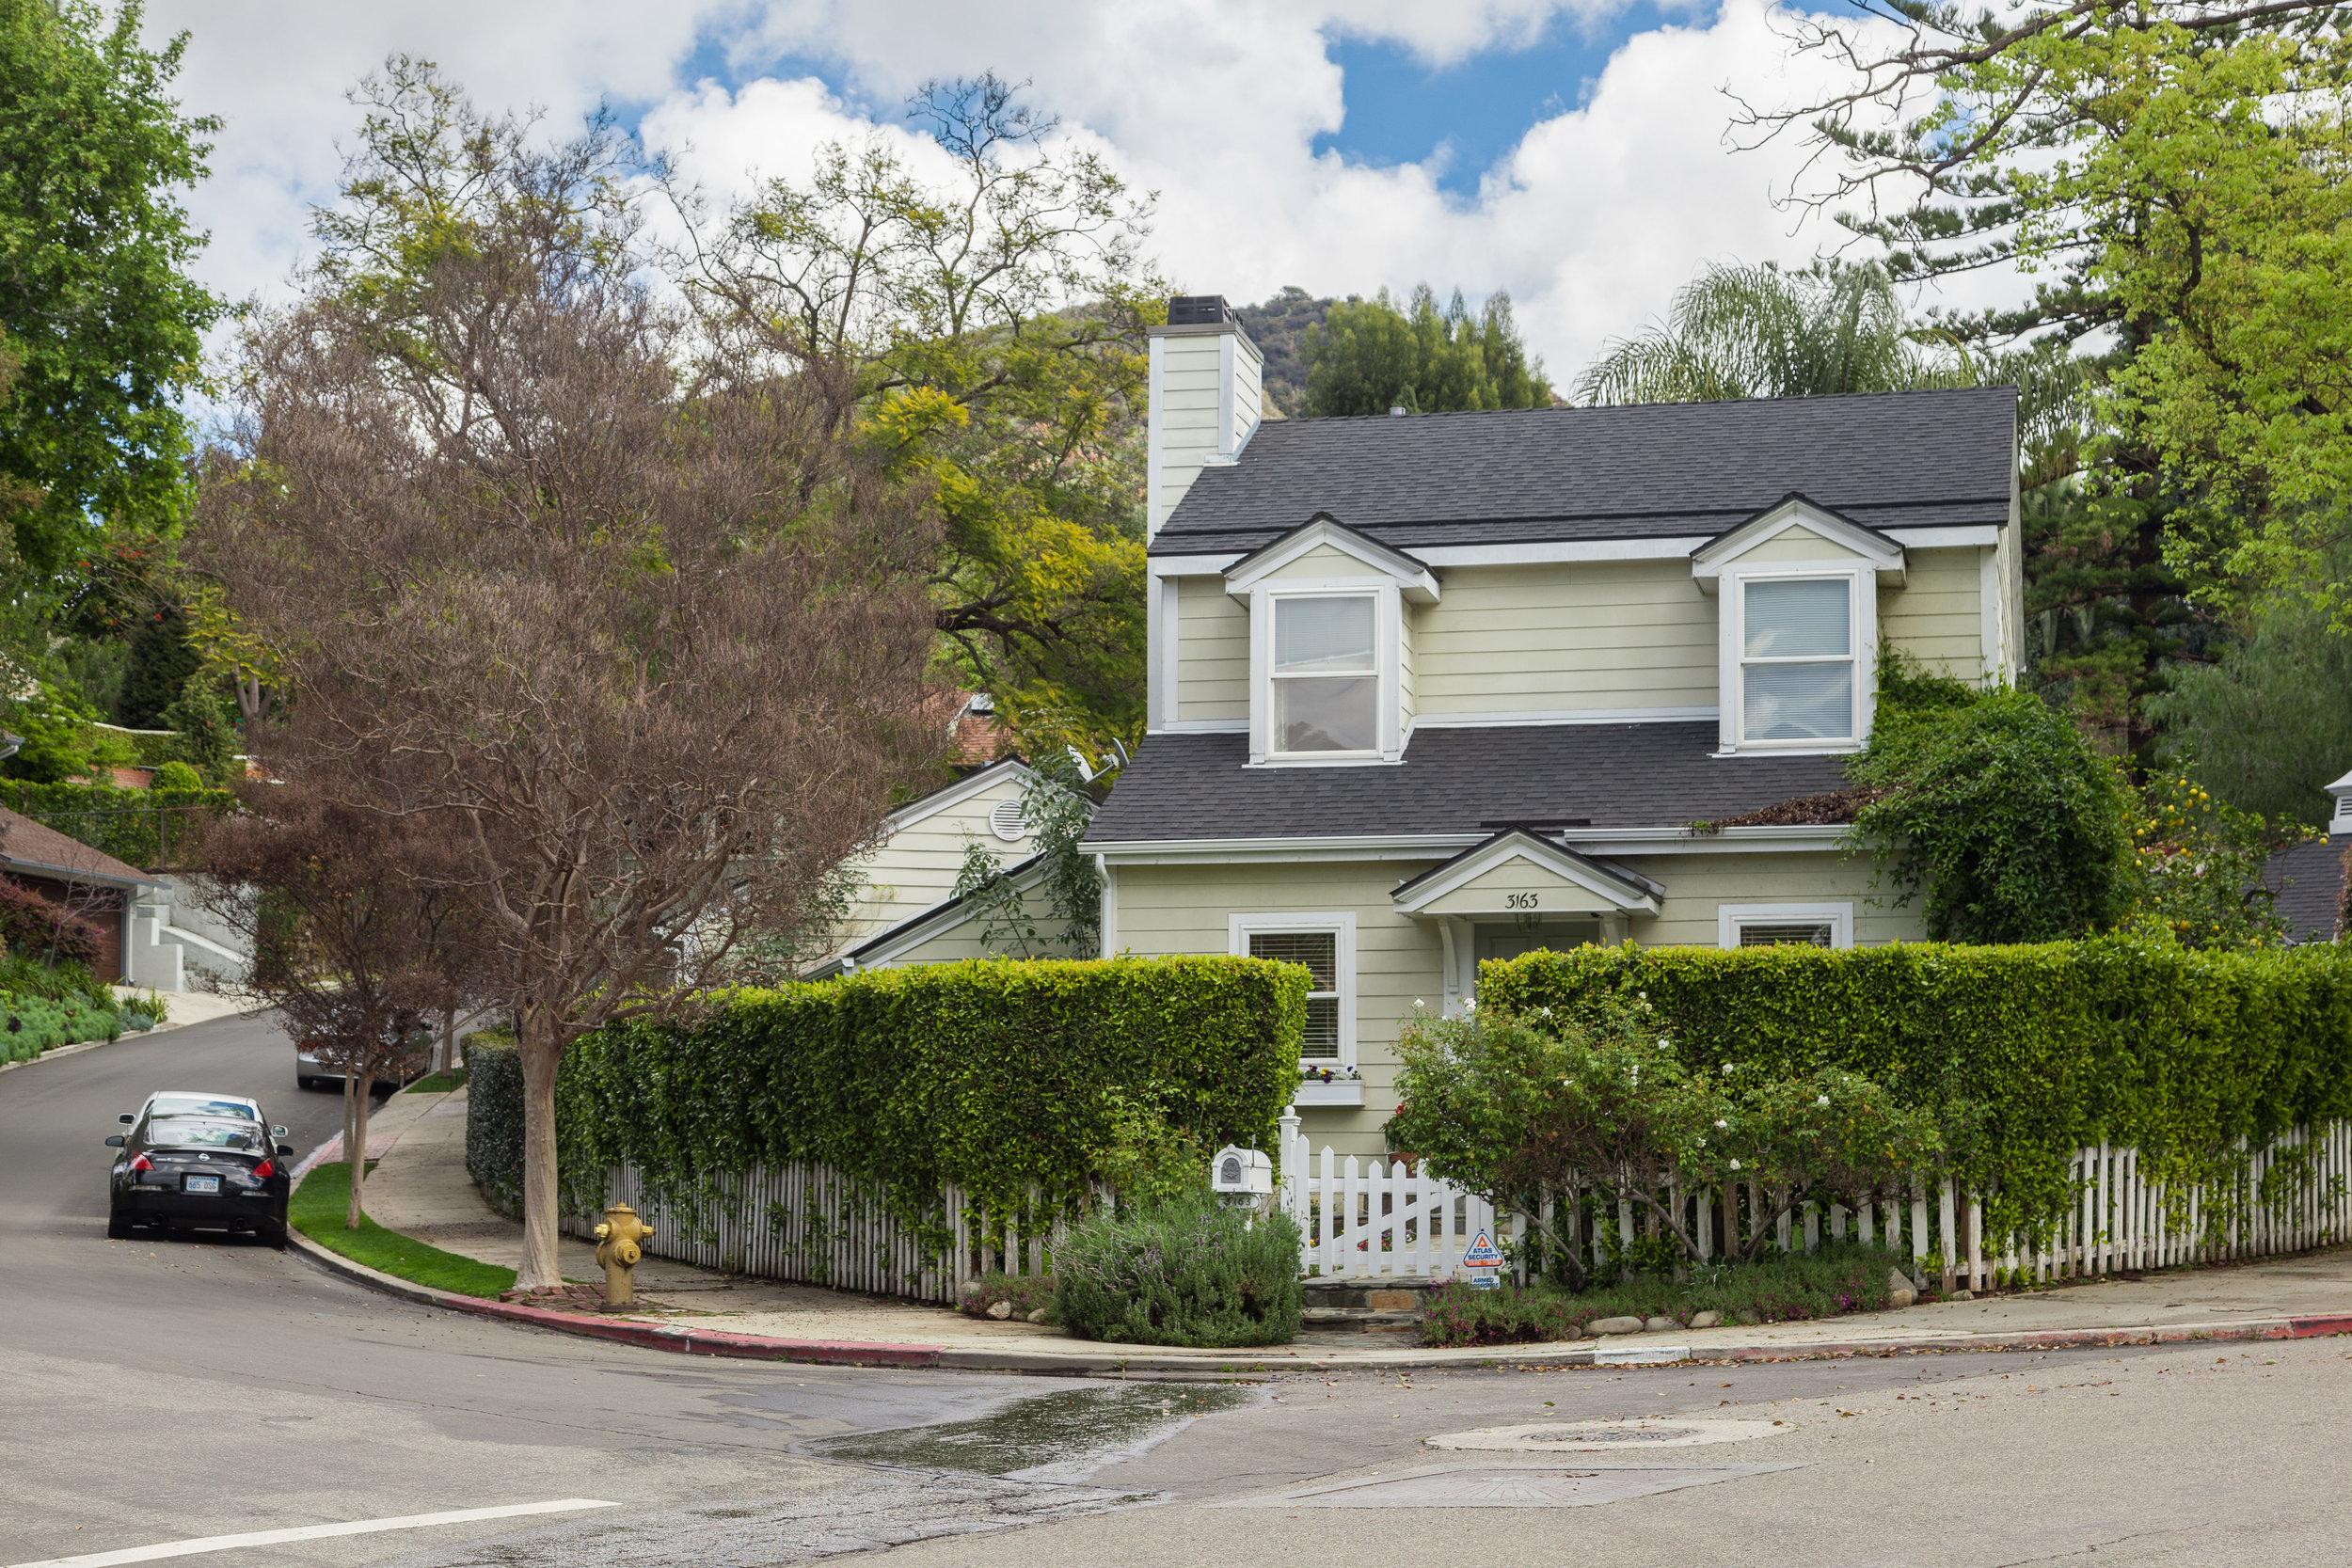 3163 La Suvida Dr Los Angeles-print-002-ExteriorFront-4200x2800-300dpi.jpg